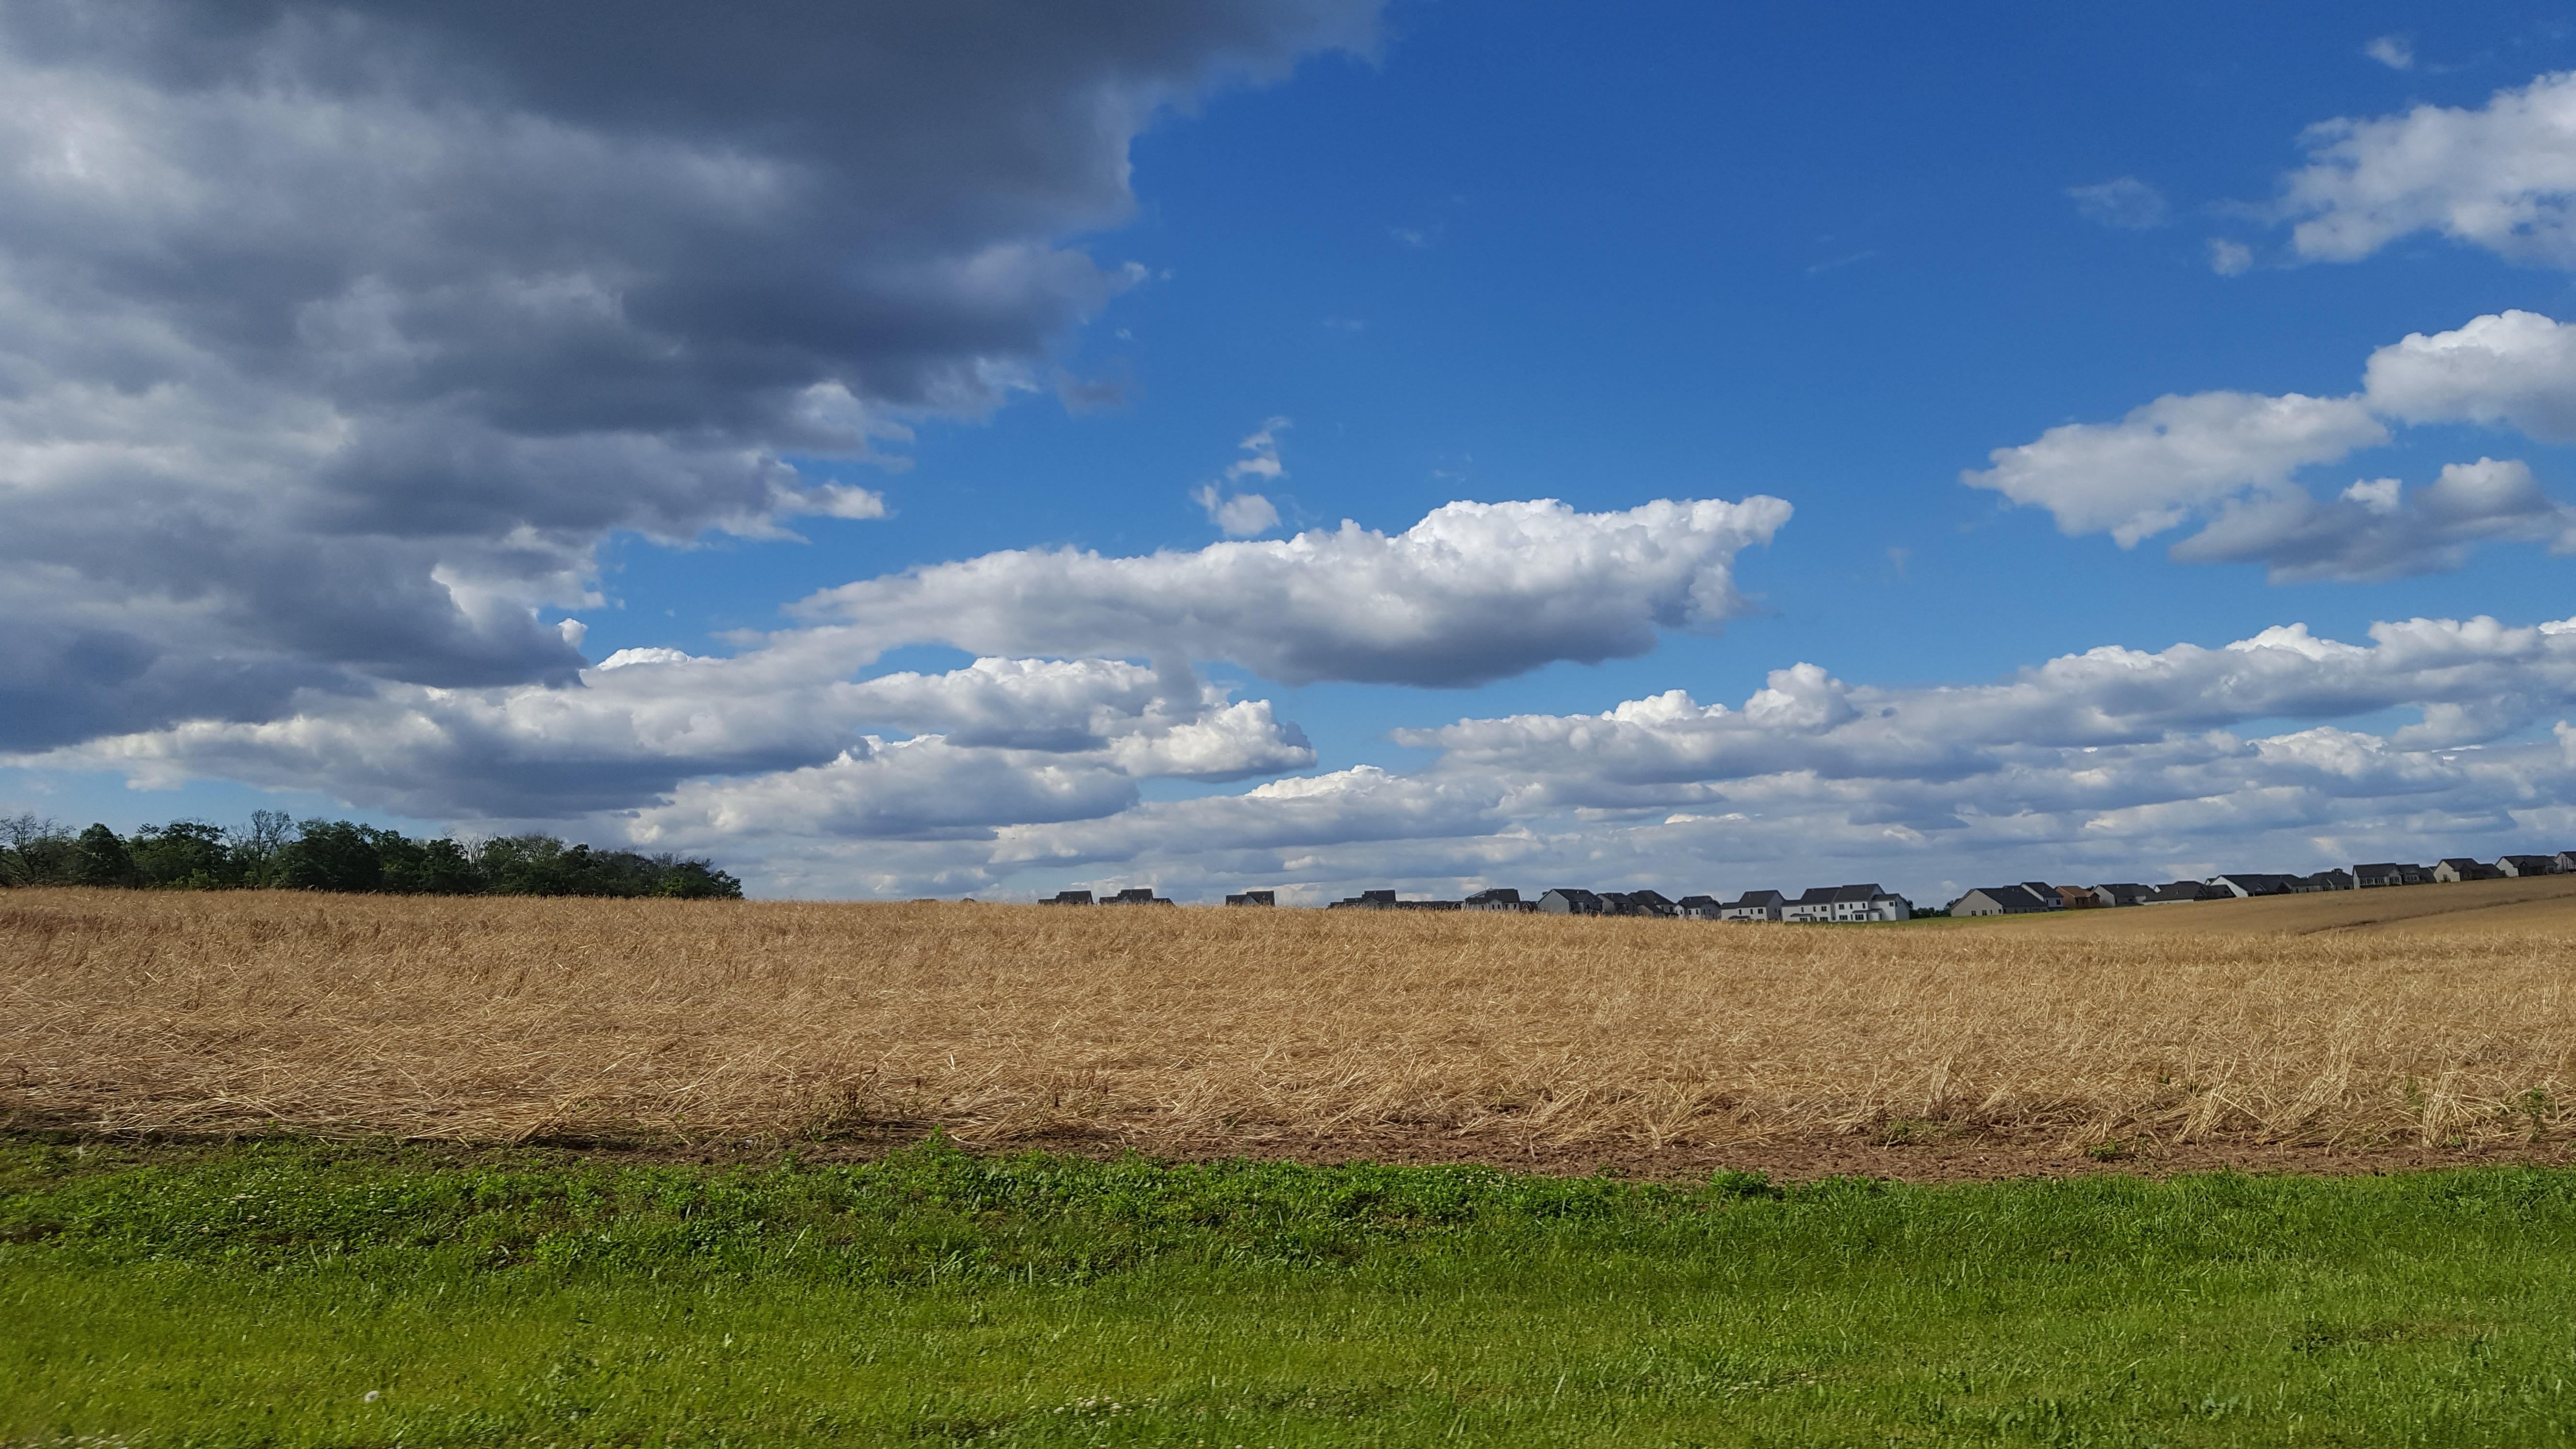 A new development peeks from behind farm fields